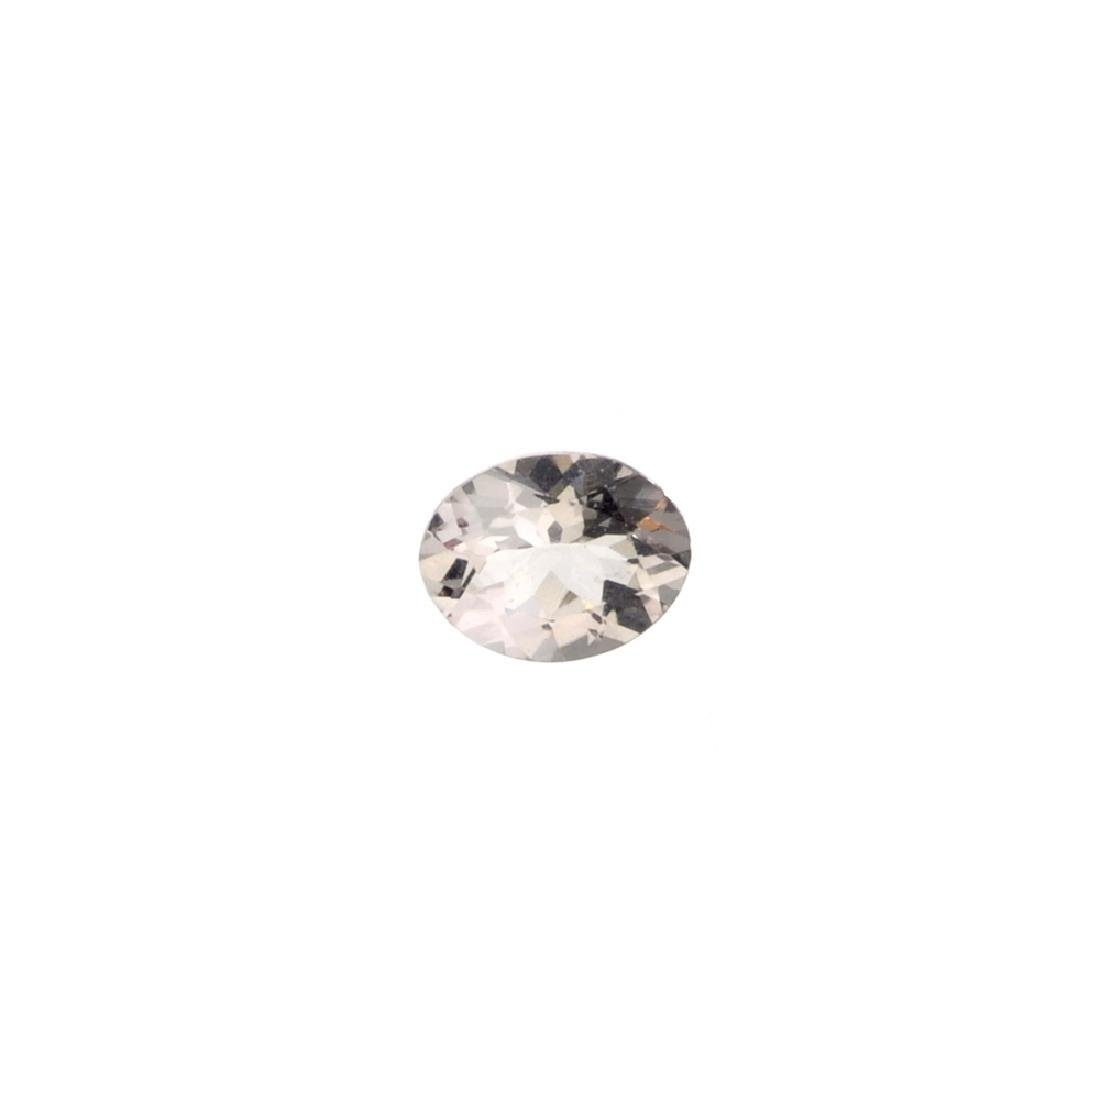 APP: 1k 1.38CT Oval Cut Morganite Gemstone